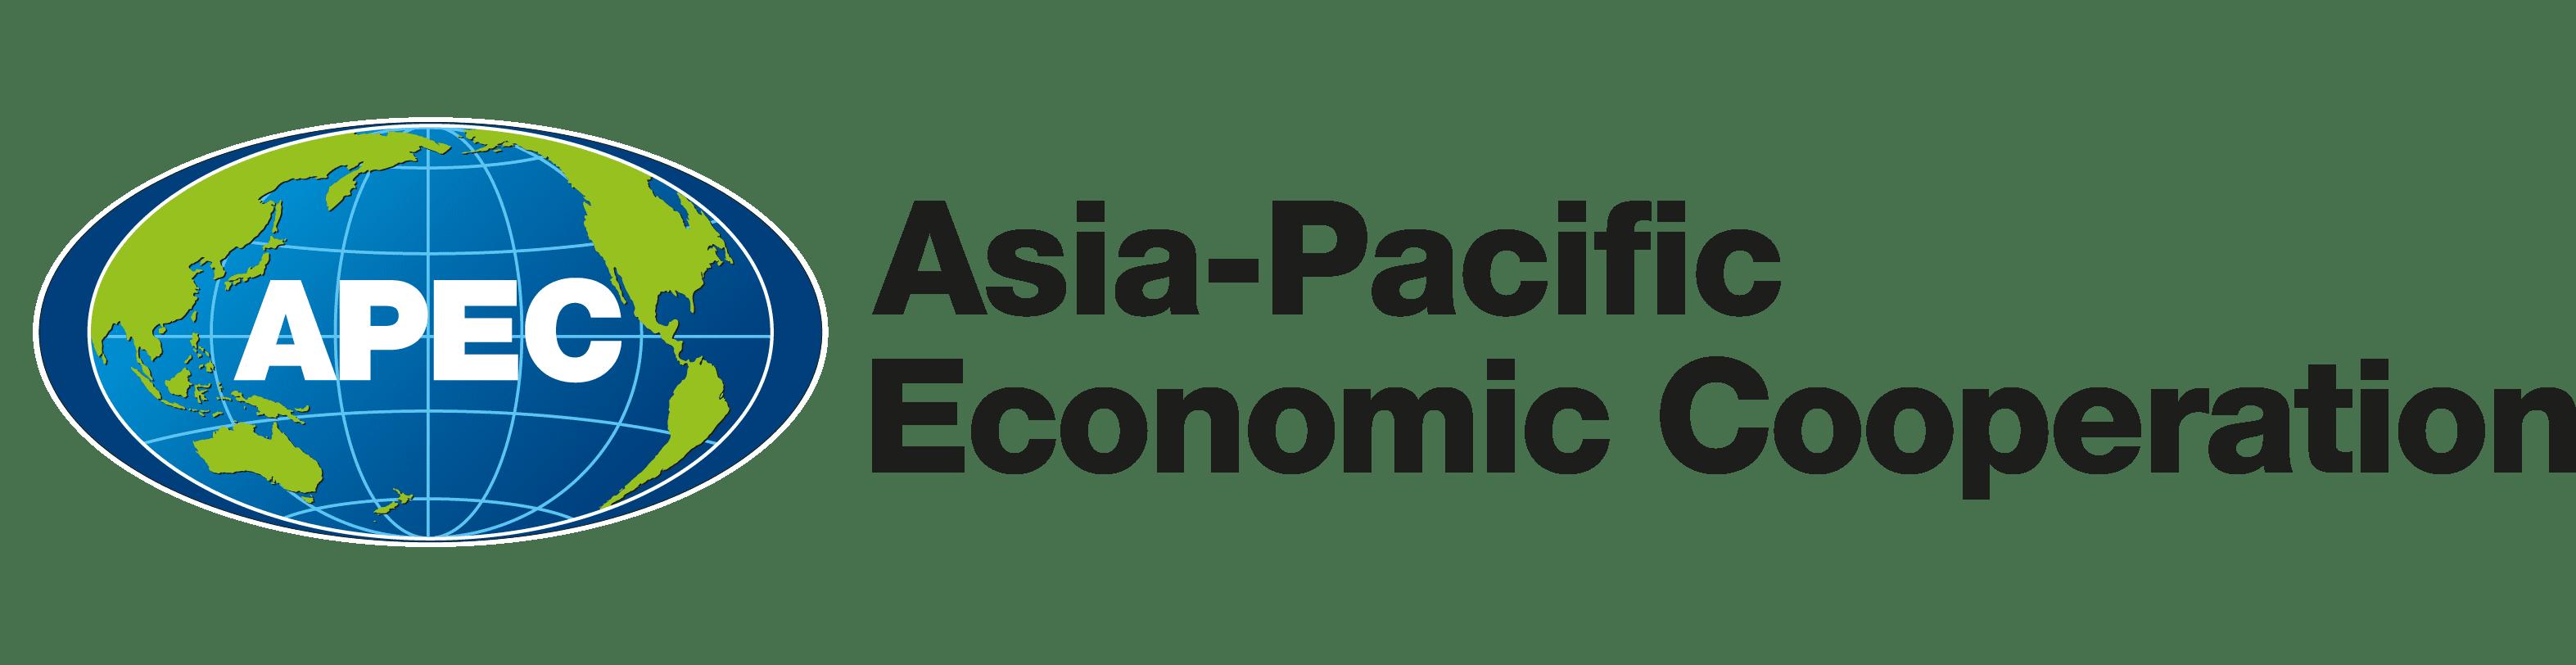 Asia Pacific Partnership